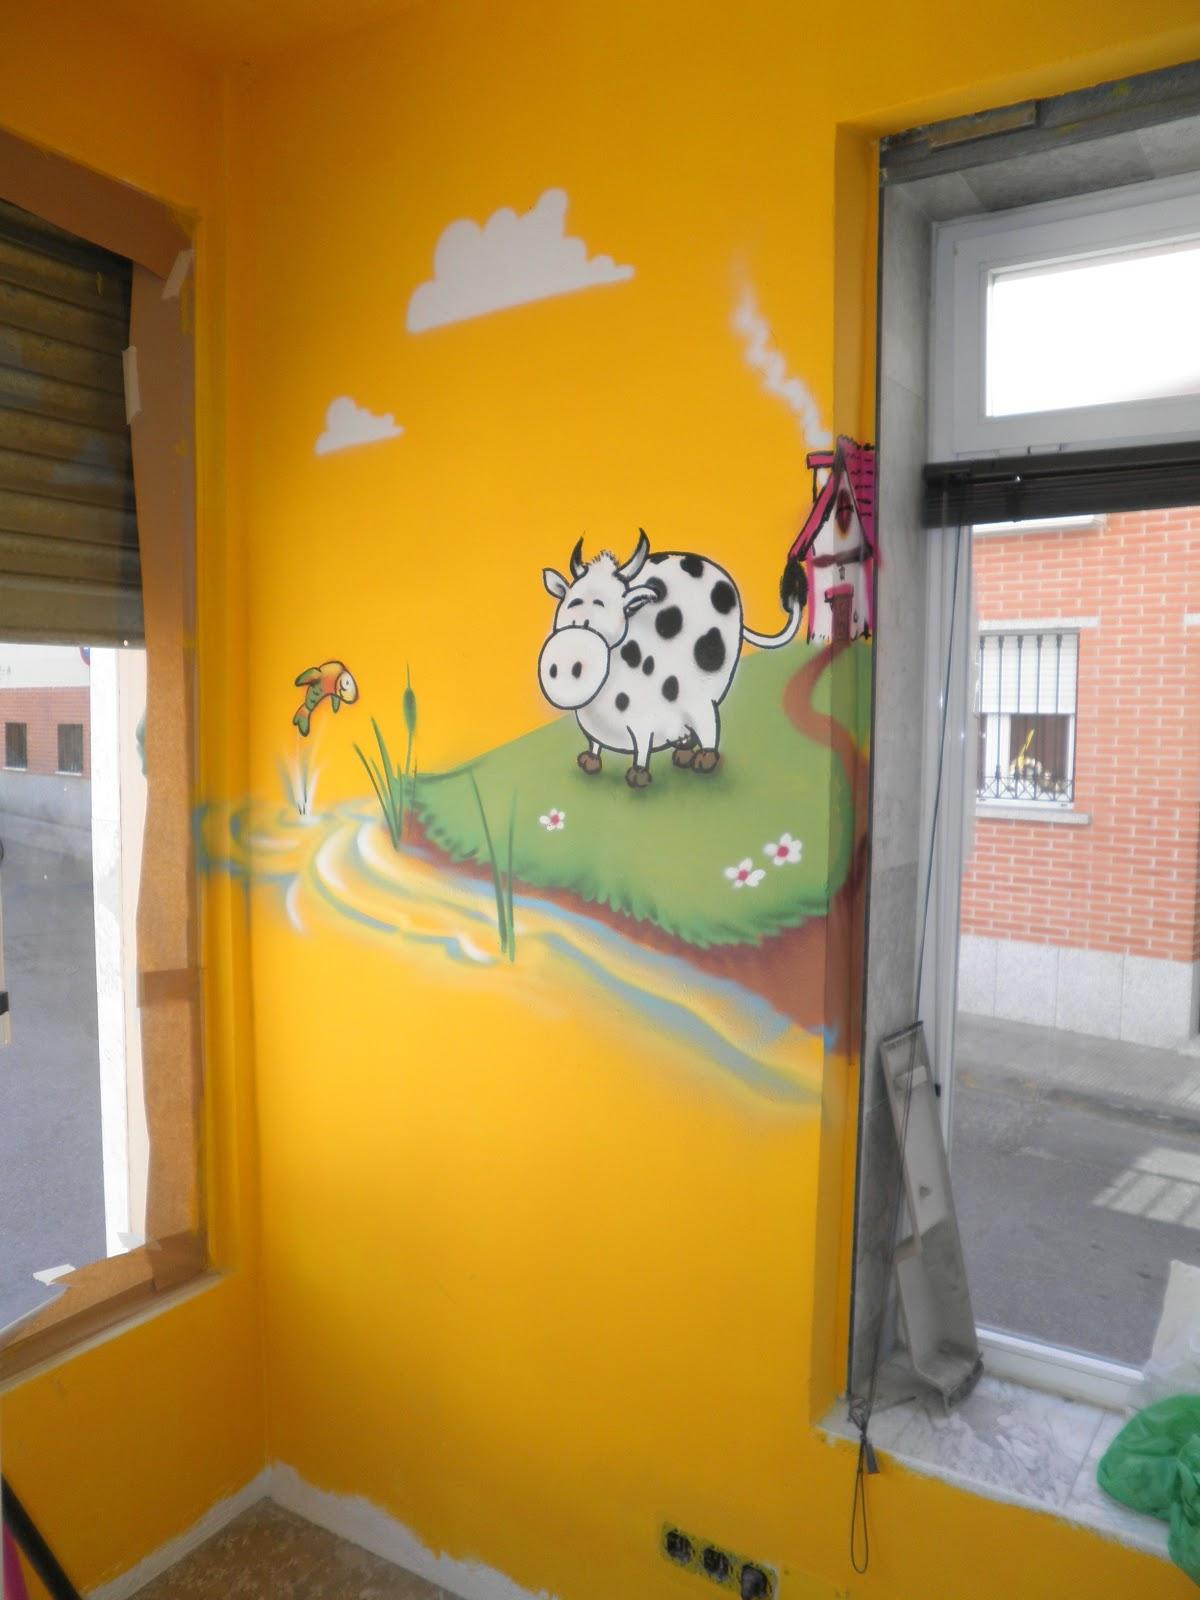 Graffiti Bolasla Tckgraffiti ProfesionalParque Rana De Bear NkZ8nPwOX0